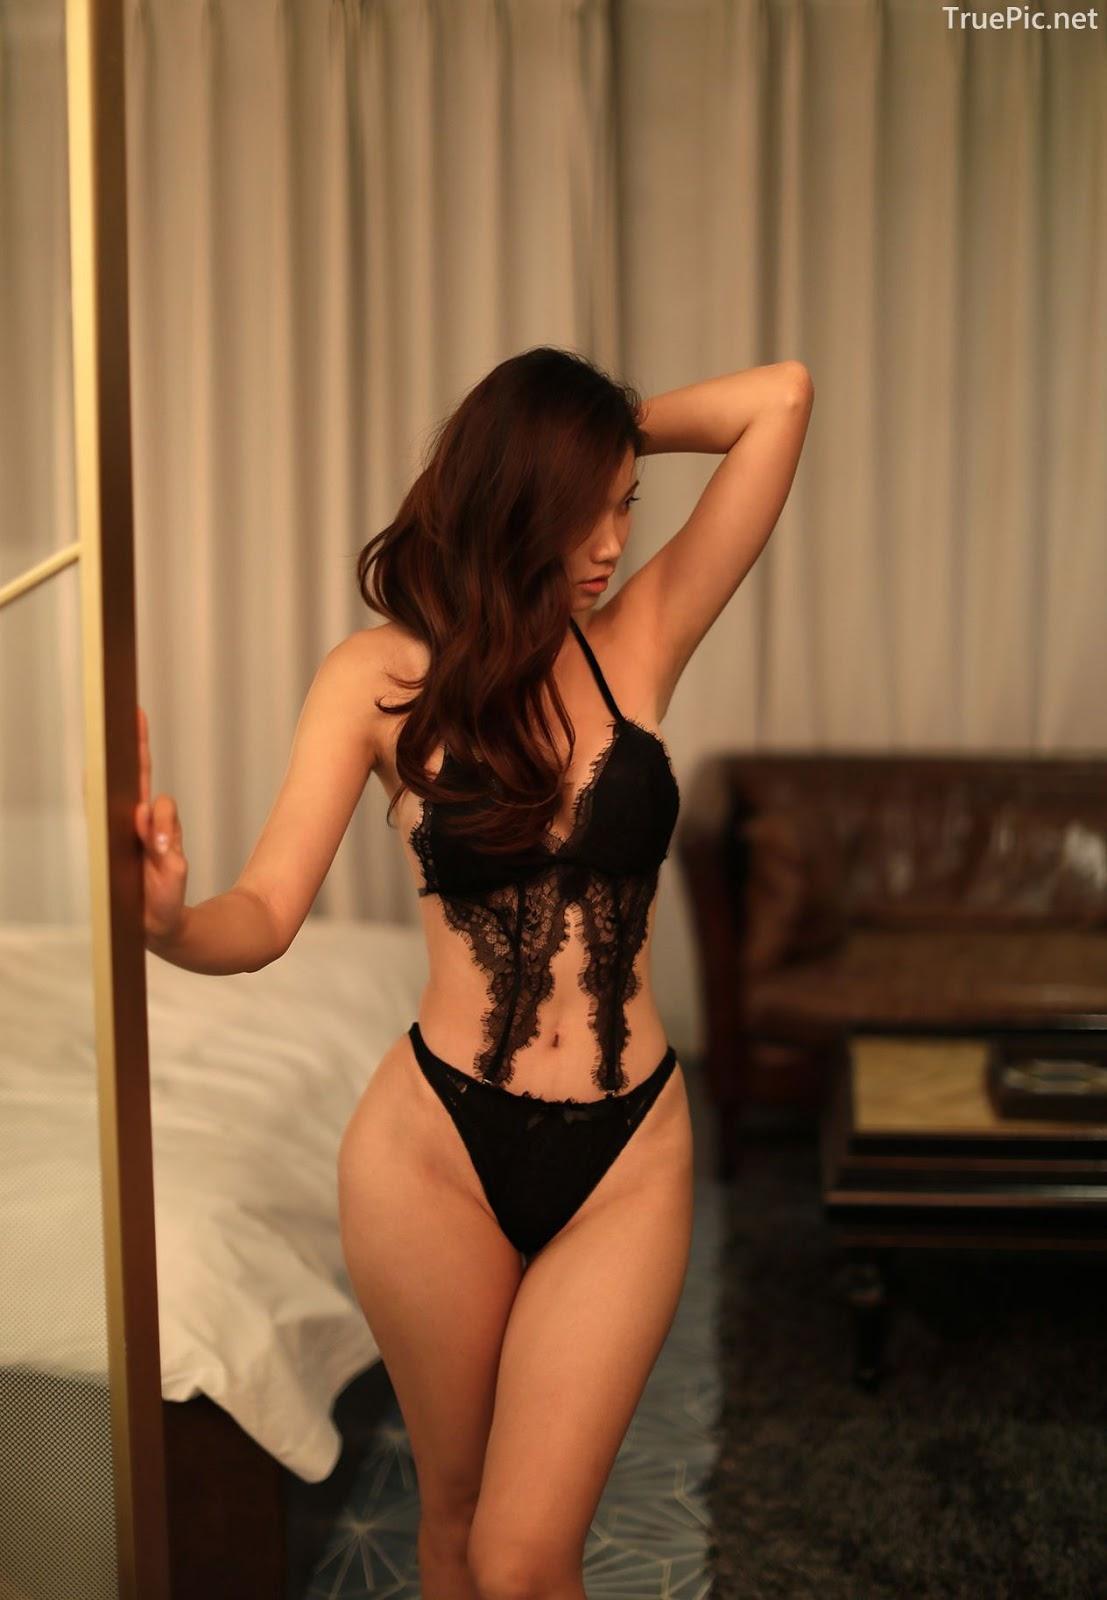 Lee Hee Eun - Bohemian lace black lingerie - Korean model and fashion - Picture 7